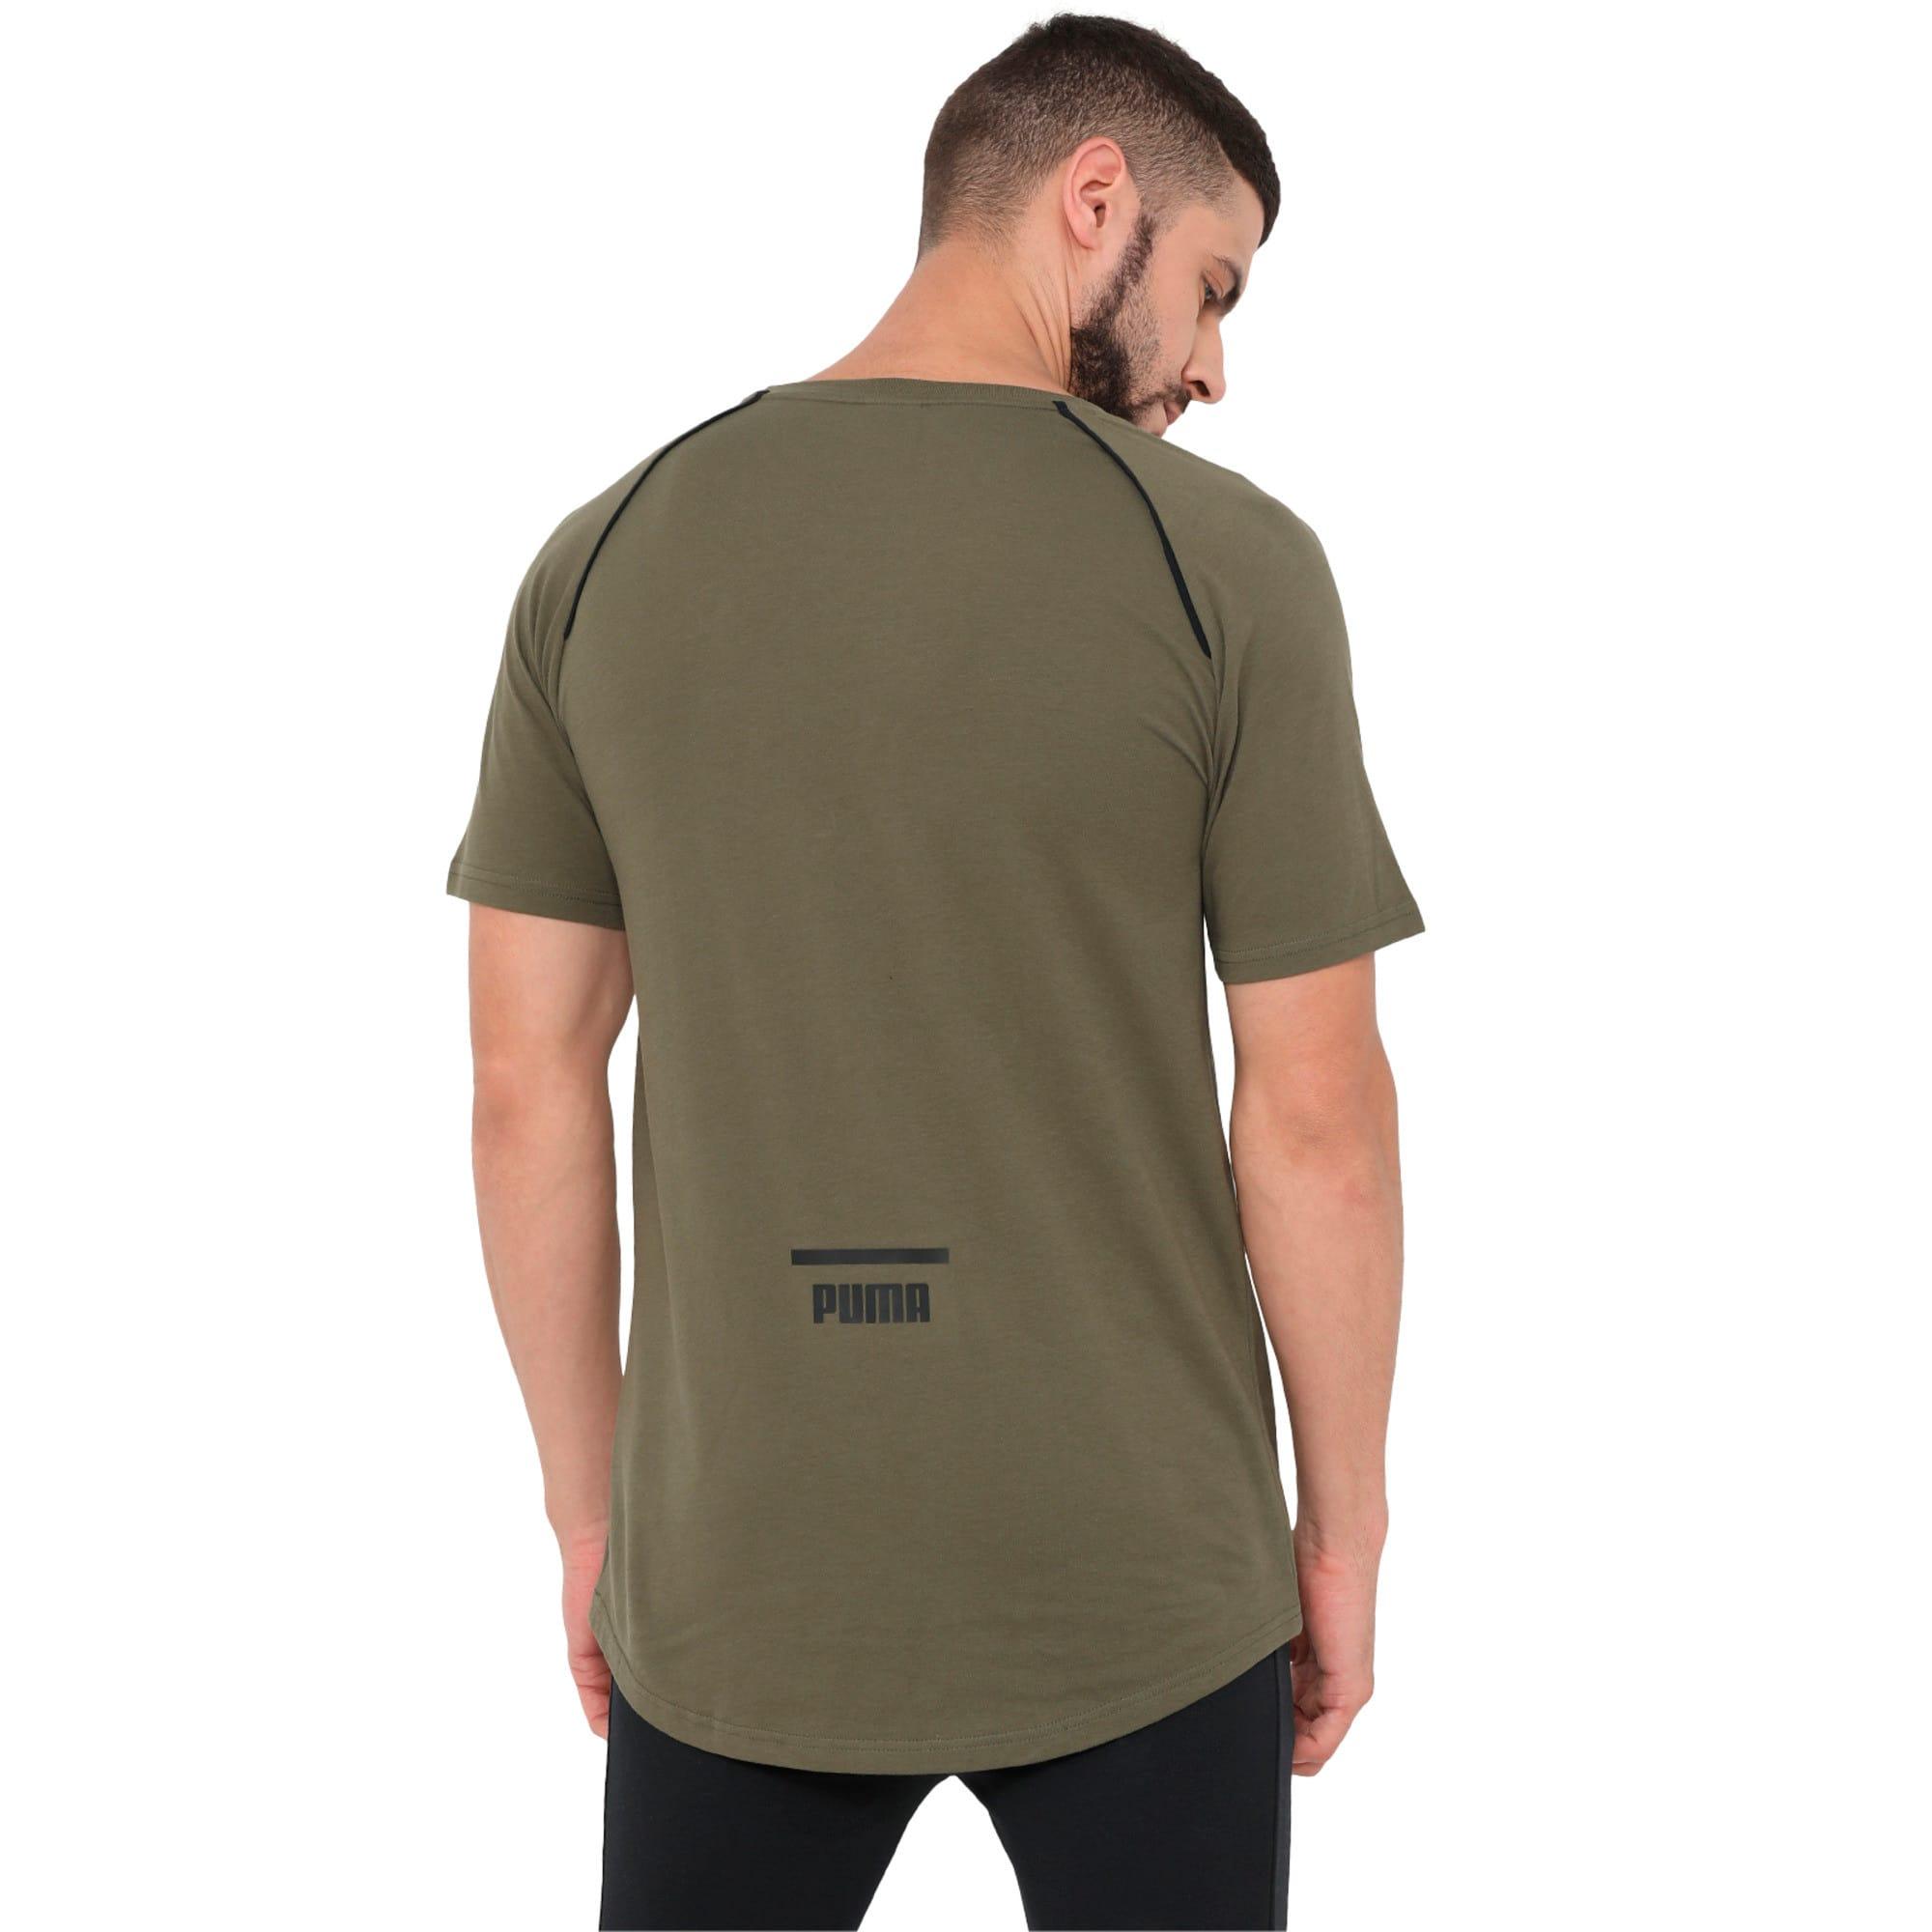 Thumbnail 2 of Evolution Men's Core T-Shirt, Olive Night, medium-IND